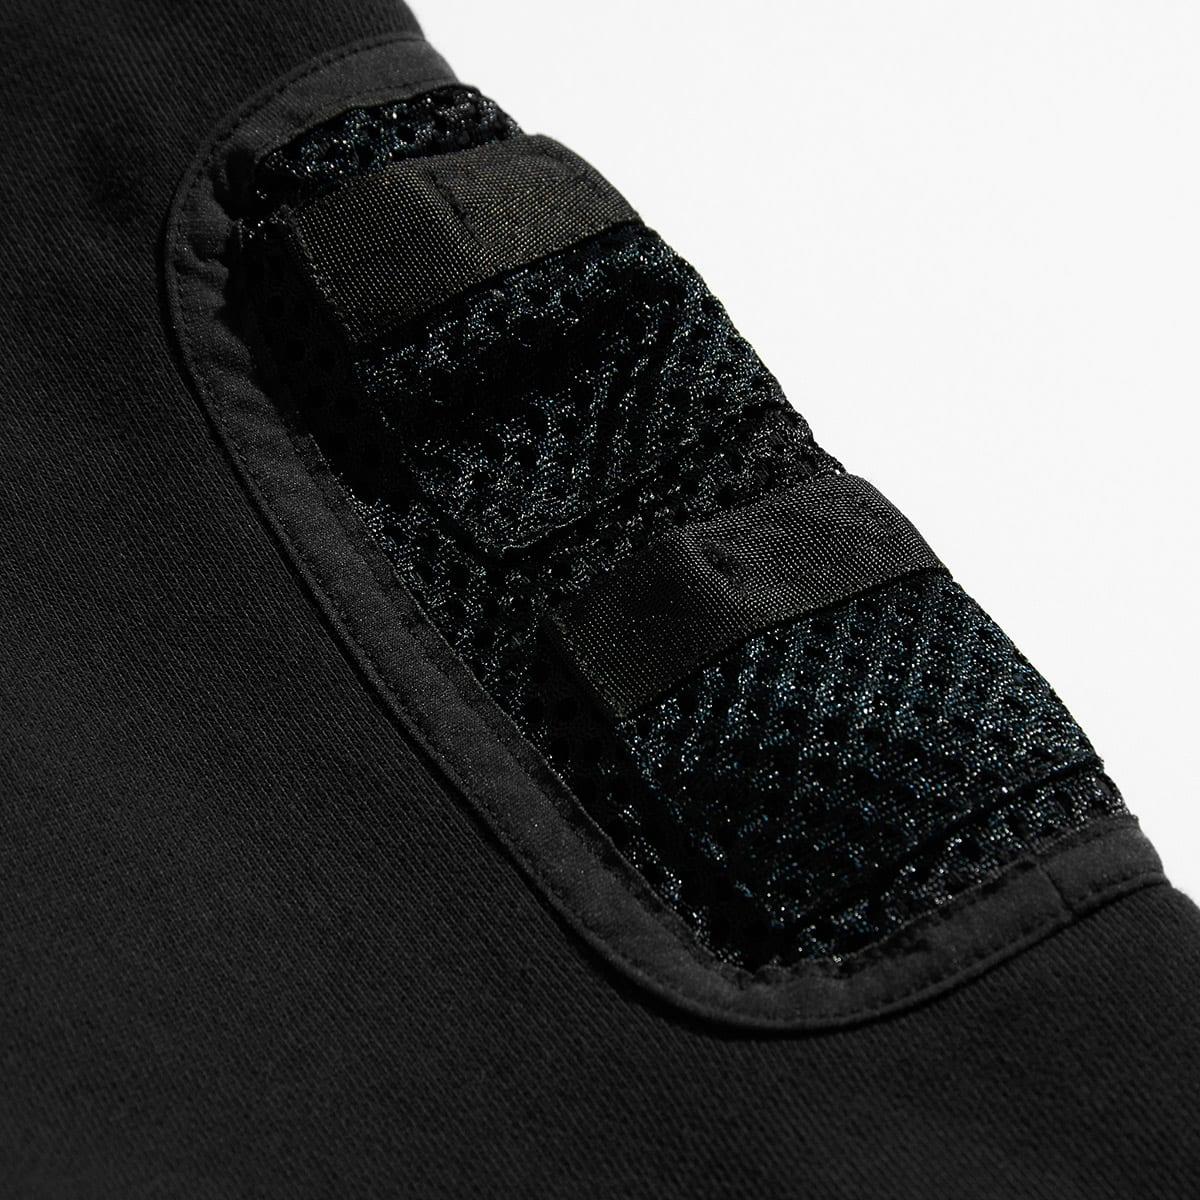 Nike x Cactus Jack Utility Hoody - CU0458-010